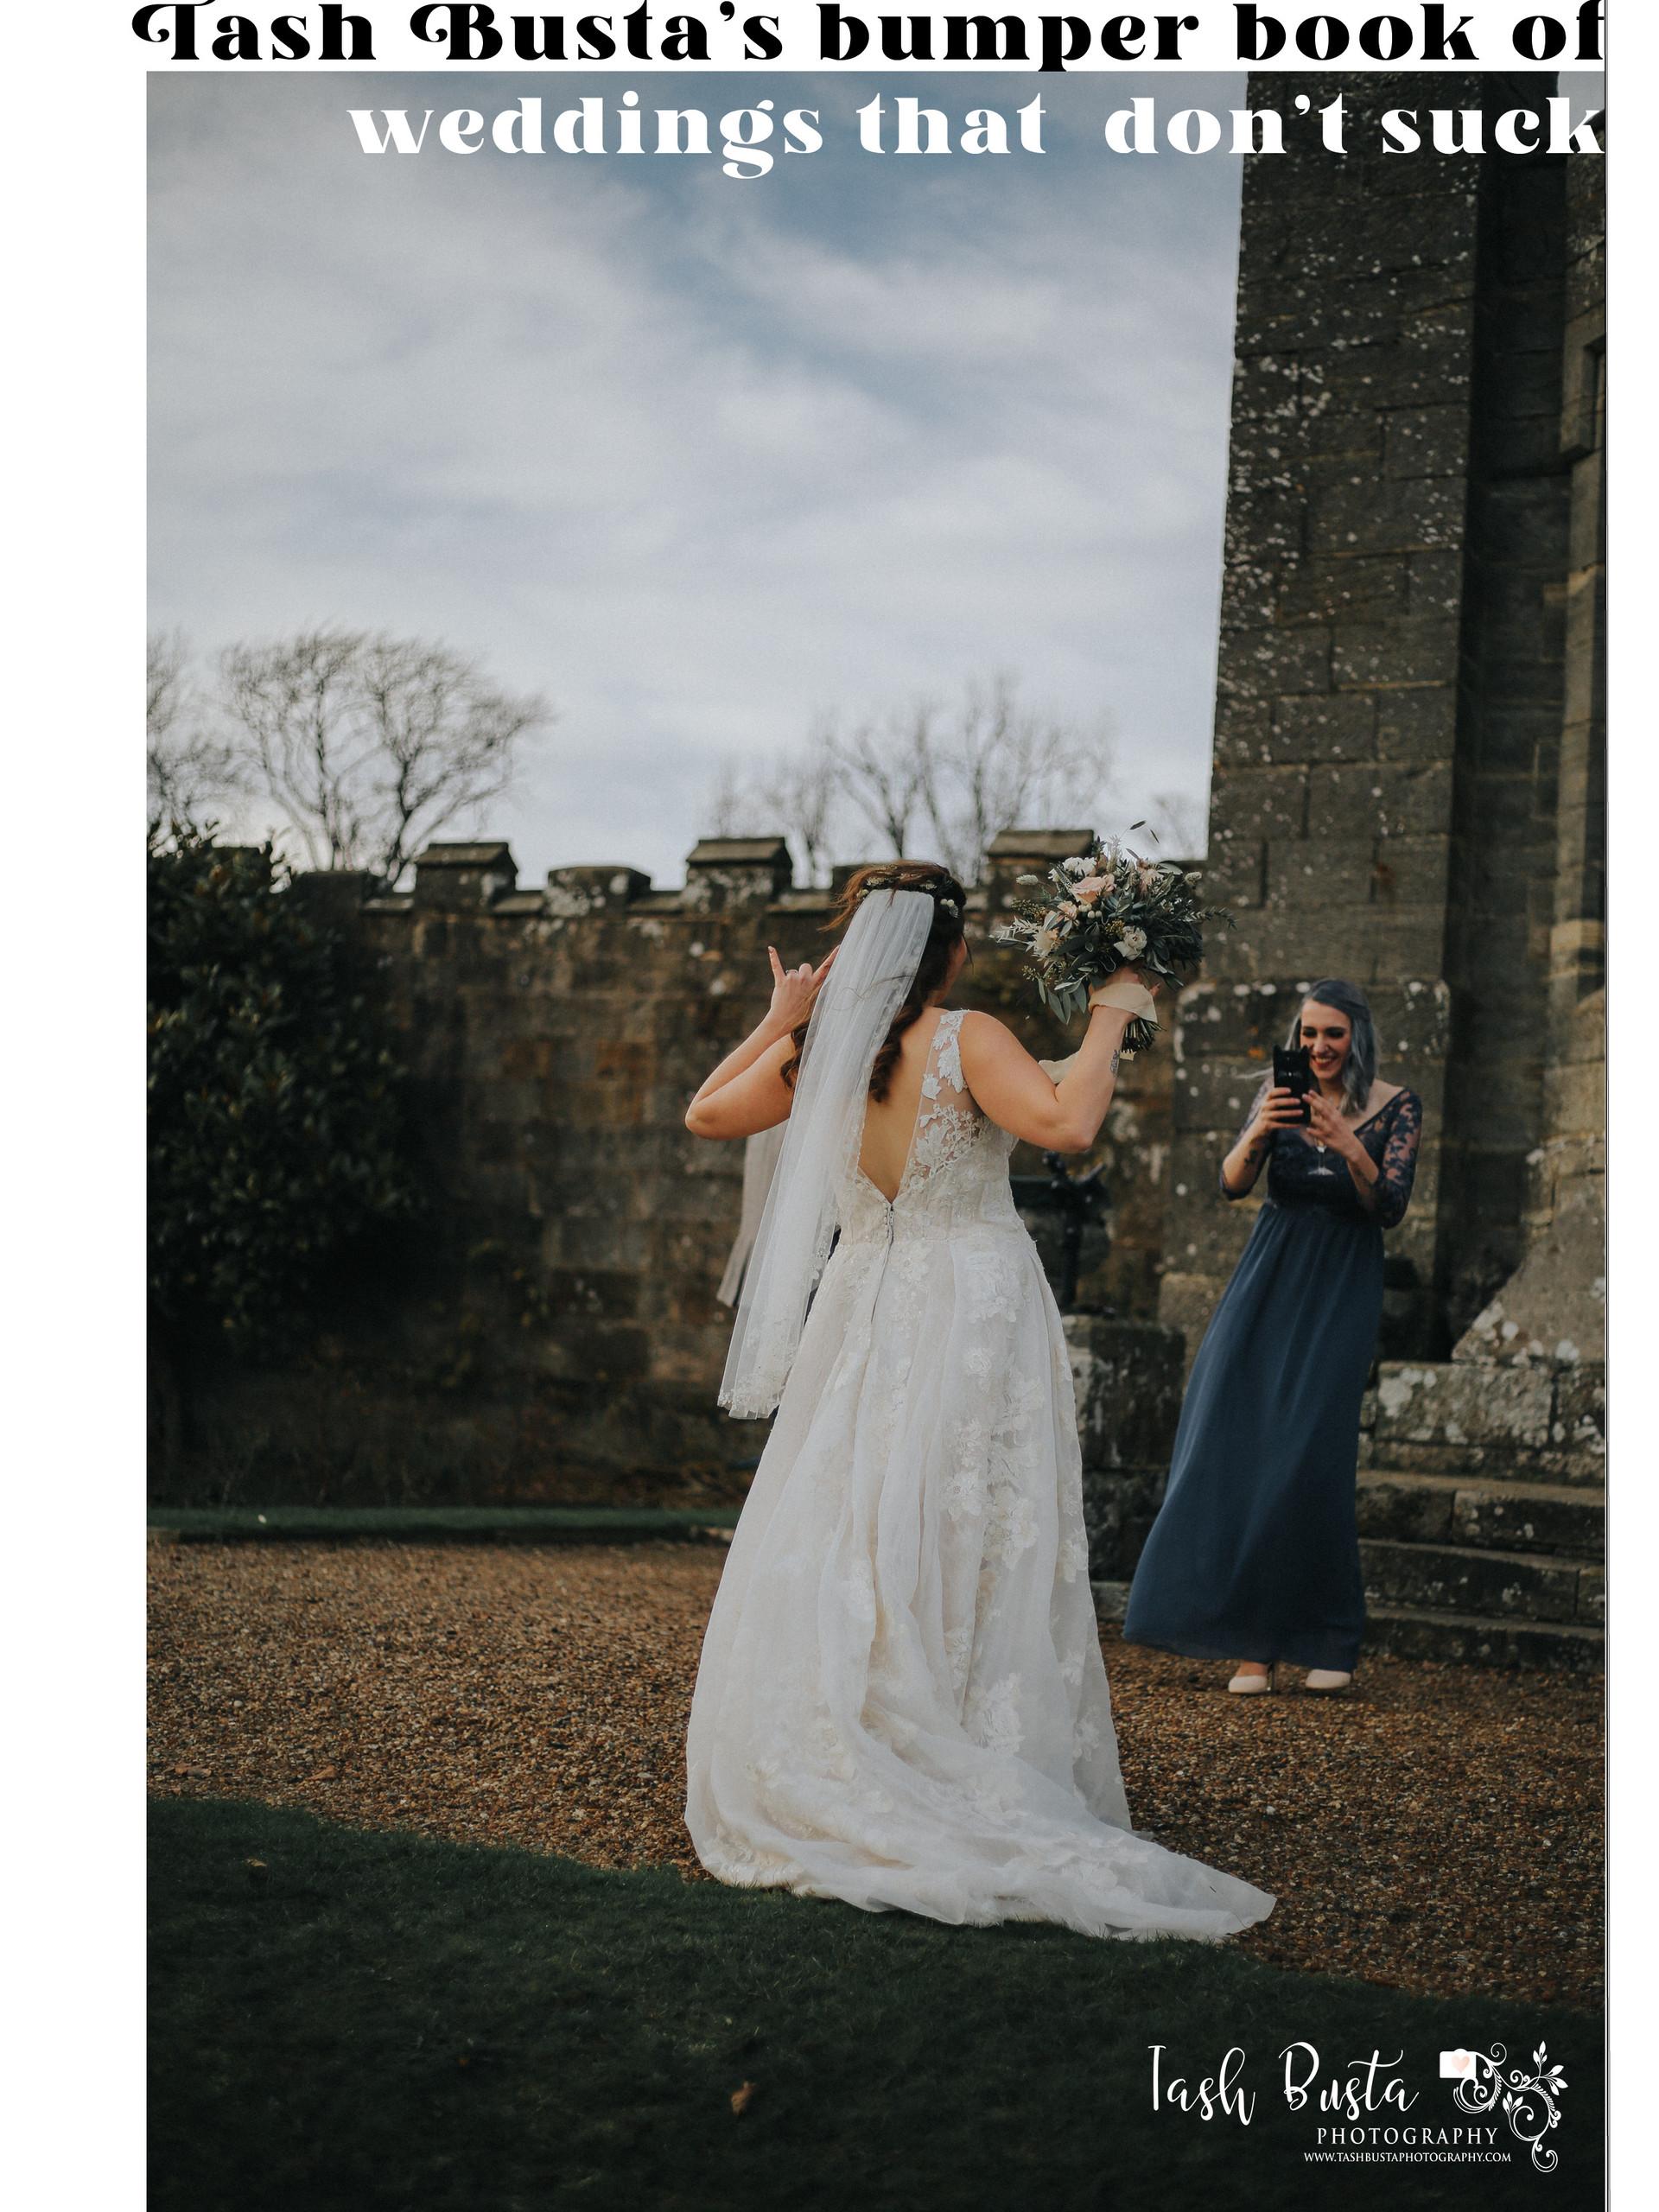 Wedding planning guide.jpg